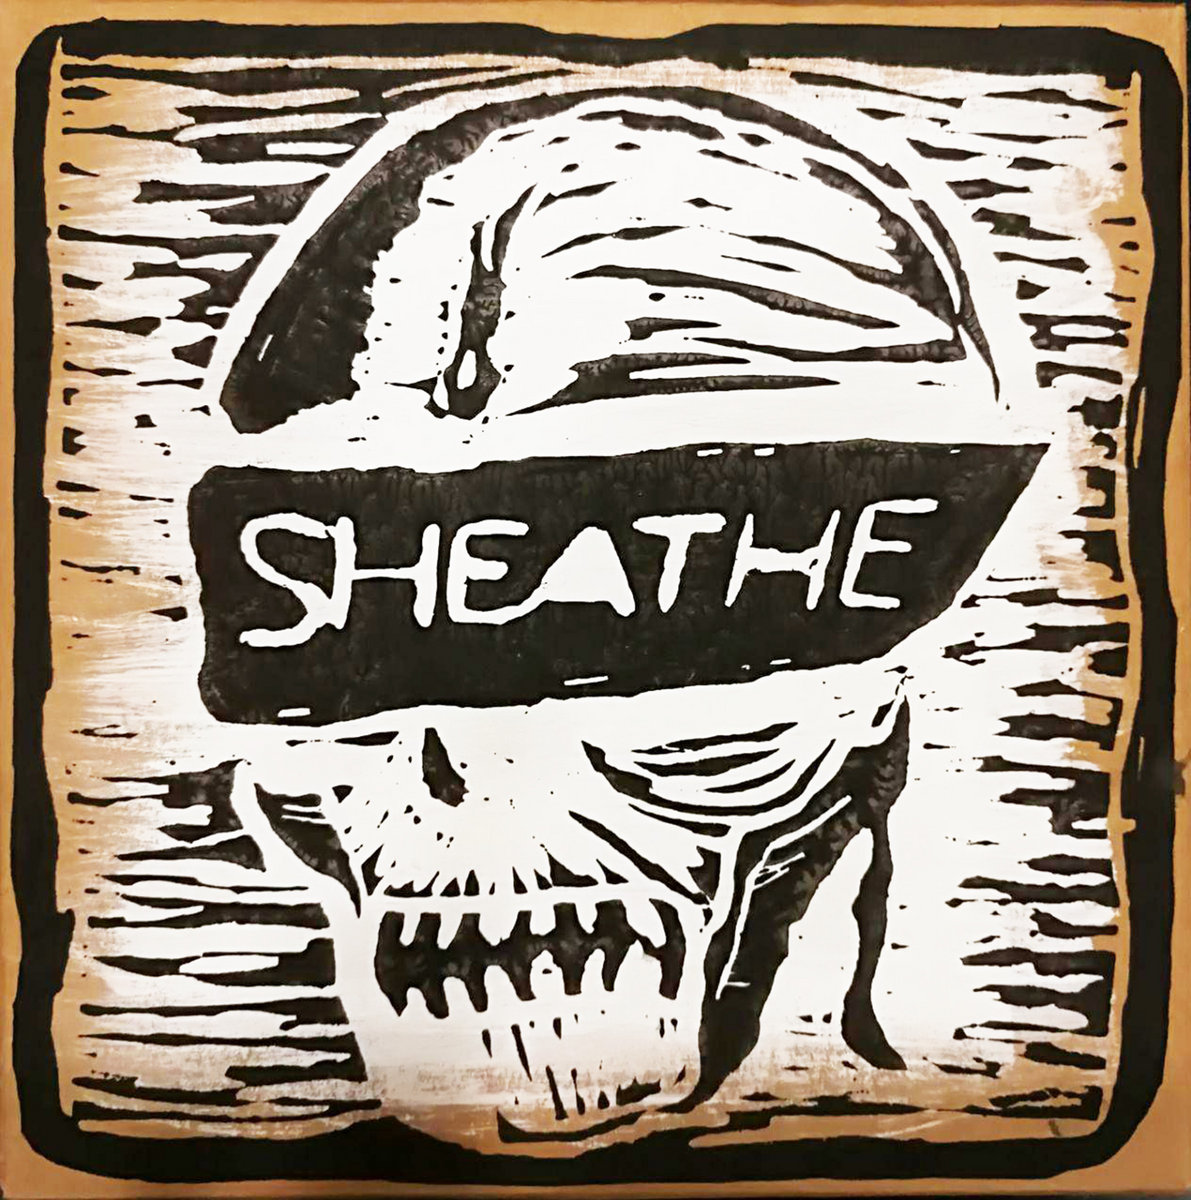 By sheathe